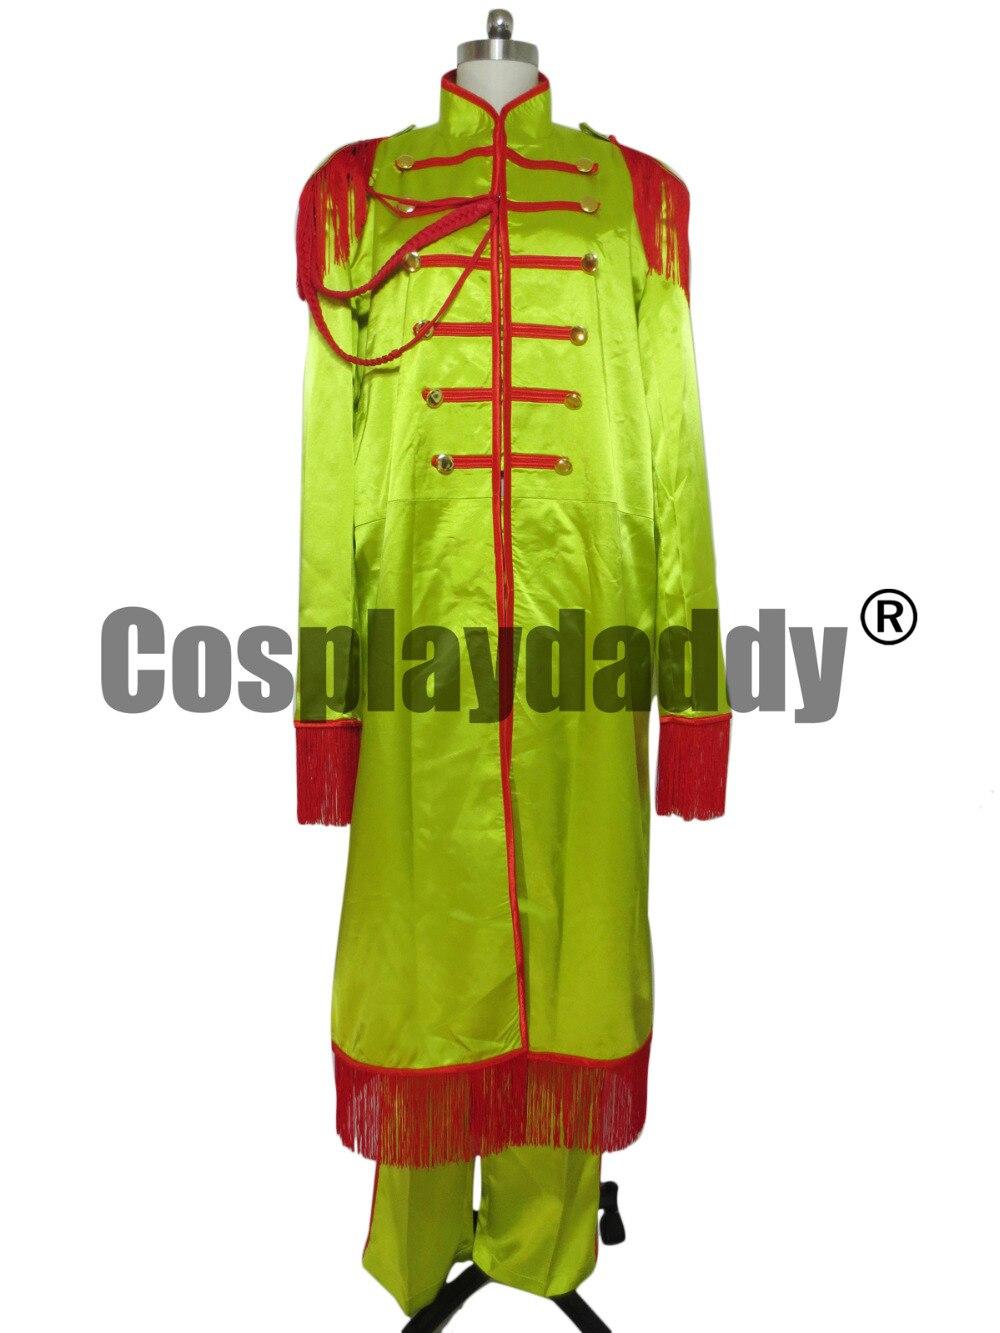 Acquista all 39 ingrosso online peperoni costumi da grossisti peperoni costumi cinesi - Costumi da bagno all ingrosso ...